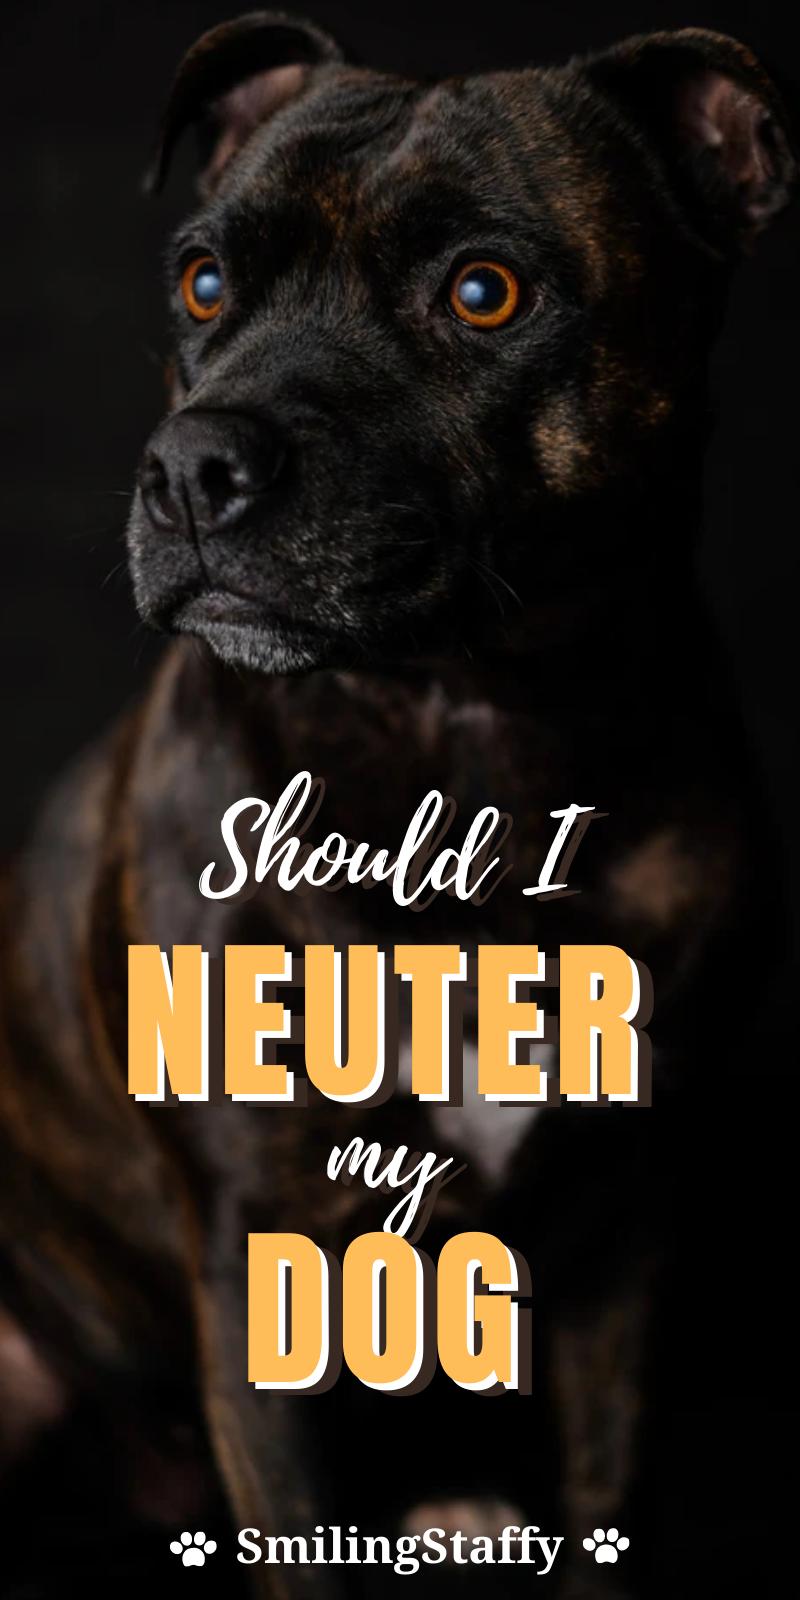 Should I Neuter my Staffy?